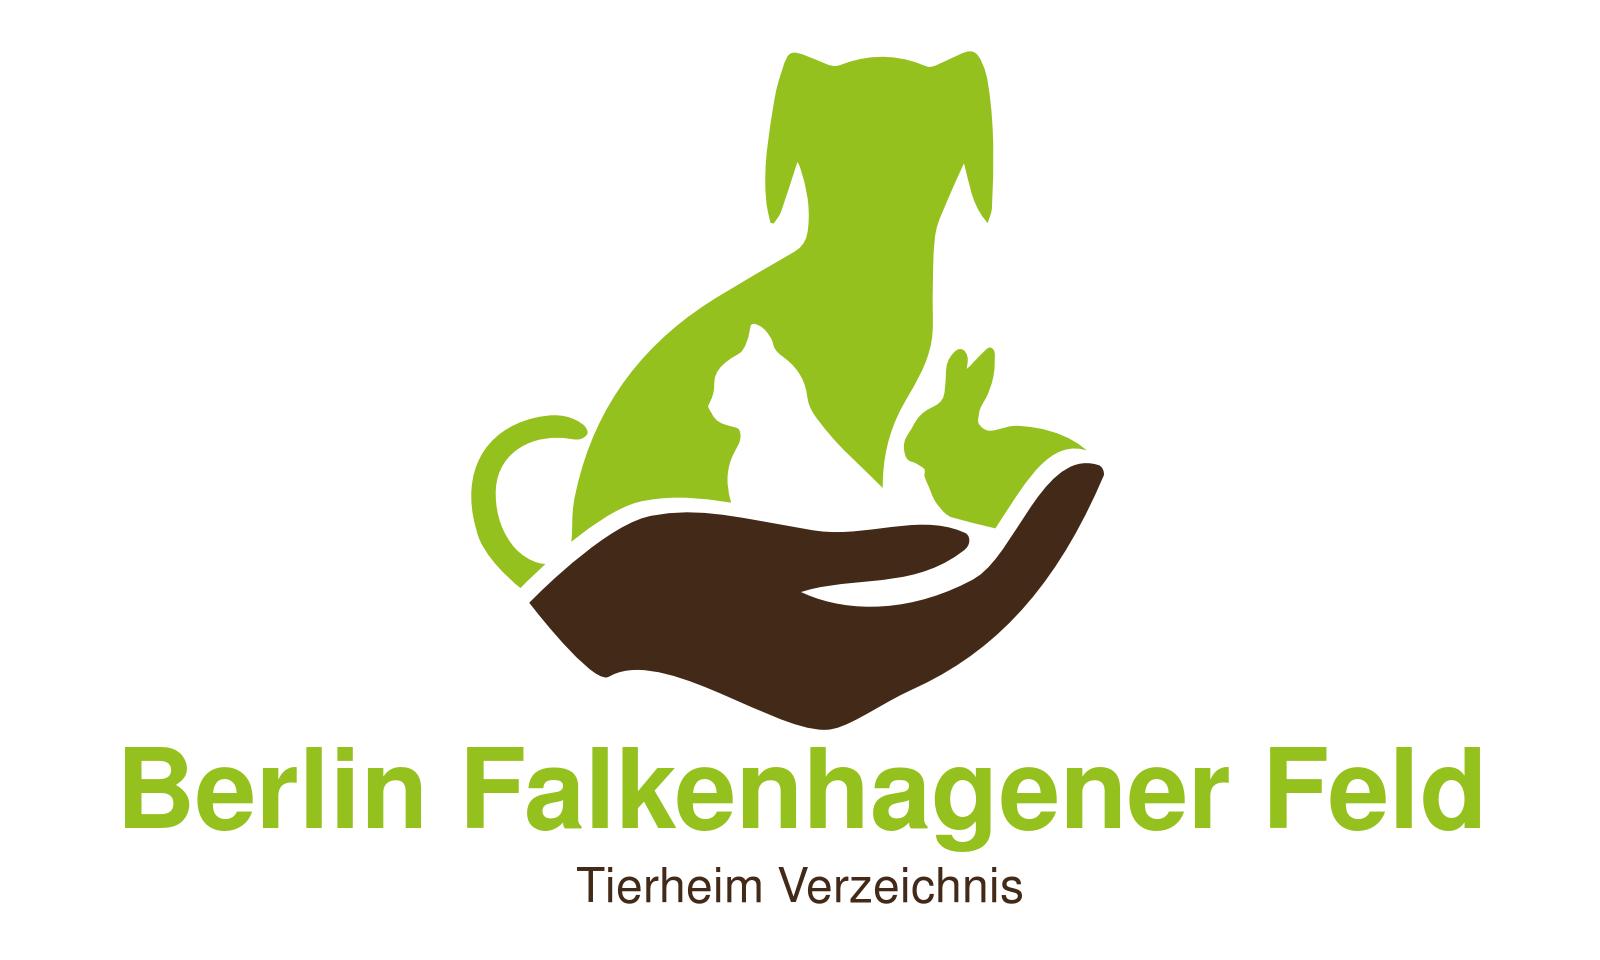 Tierheim Berlin Falkenhagener Feld